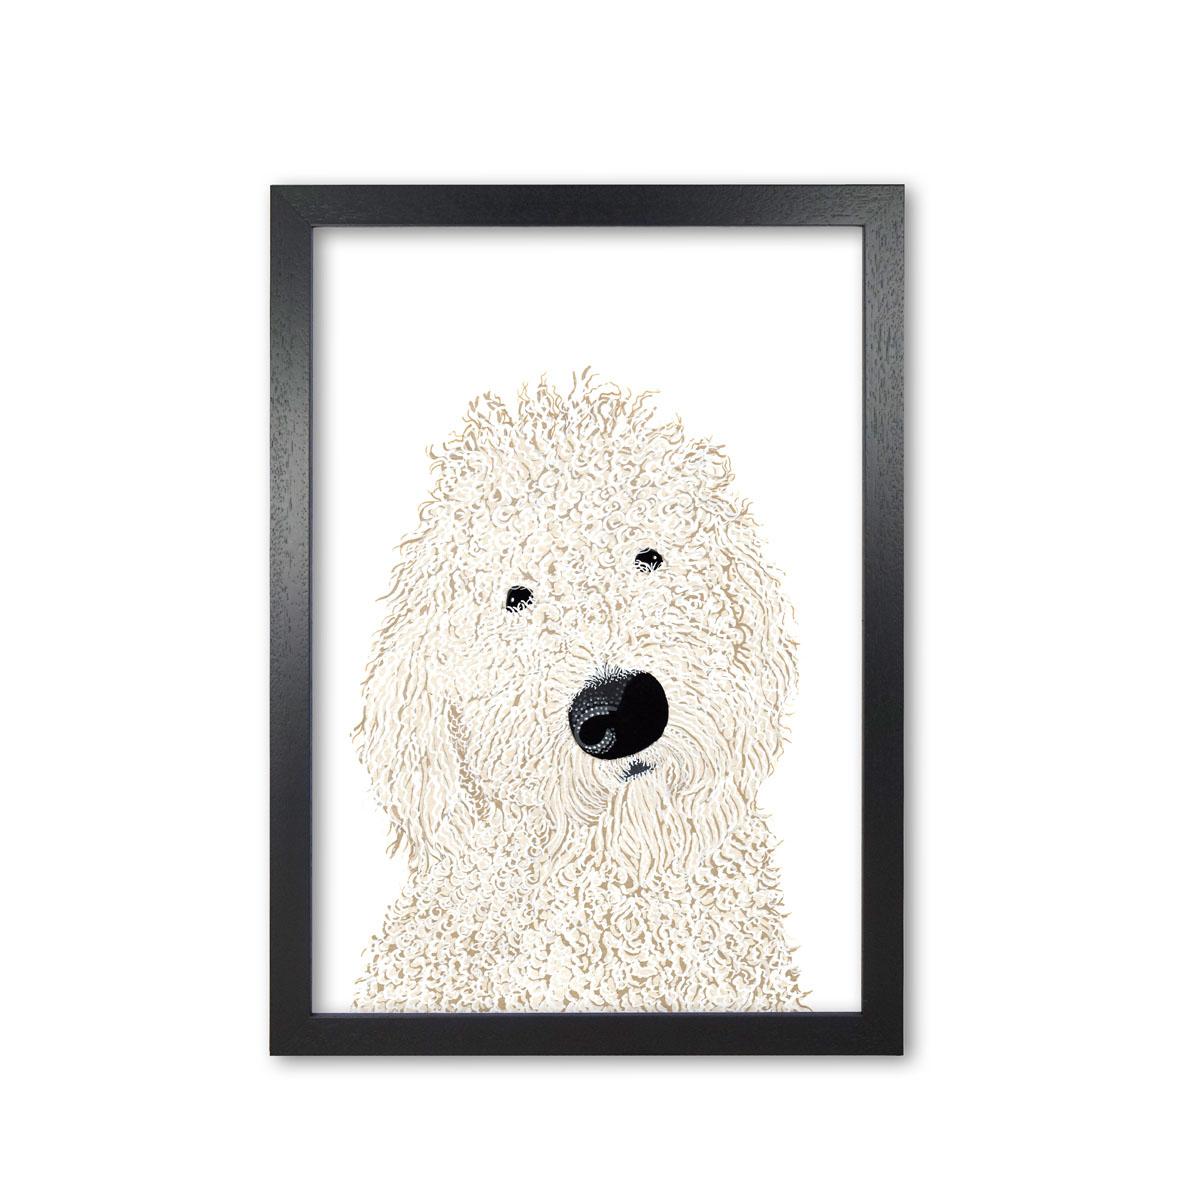 Labrddodle Dog Art Print by Bird The Artist